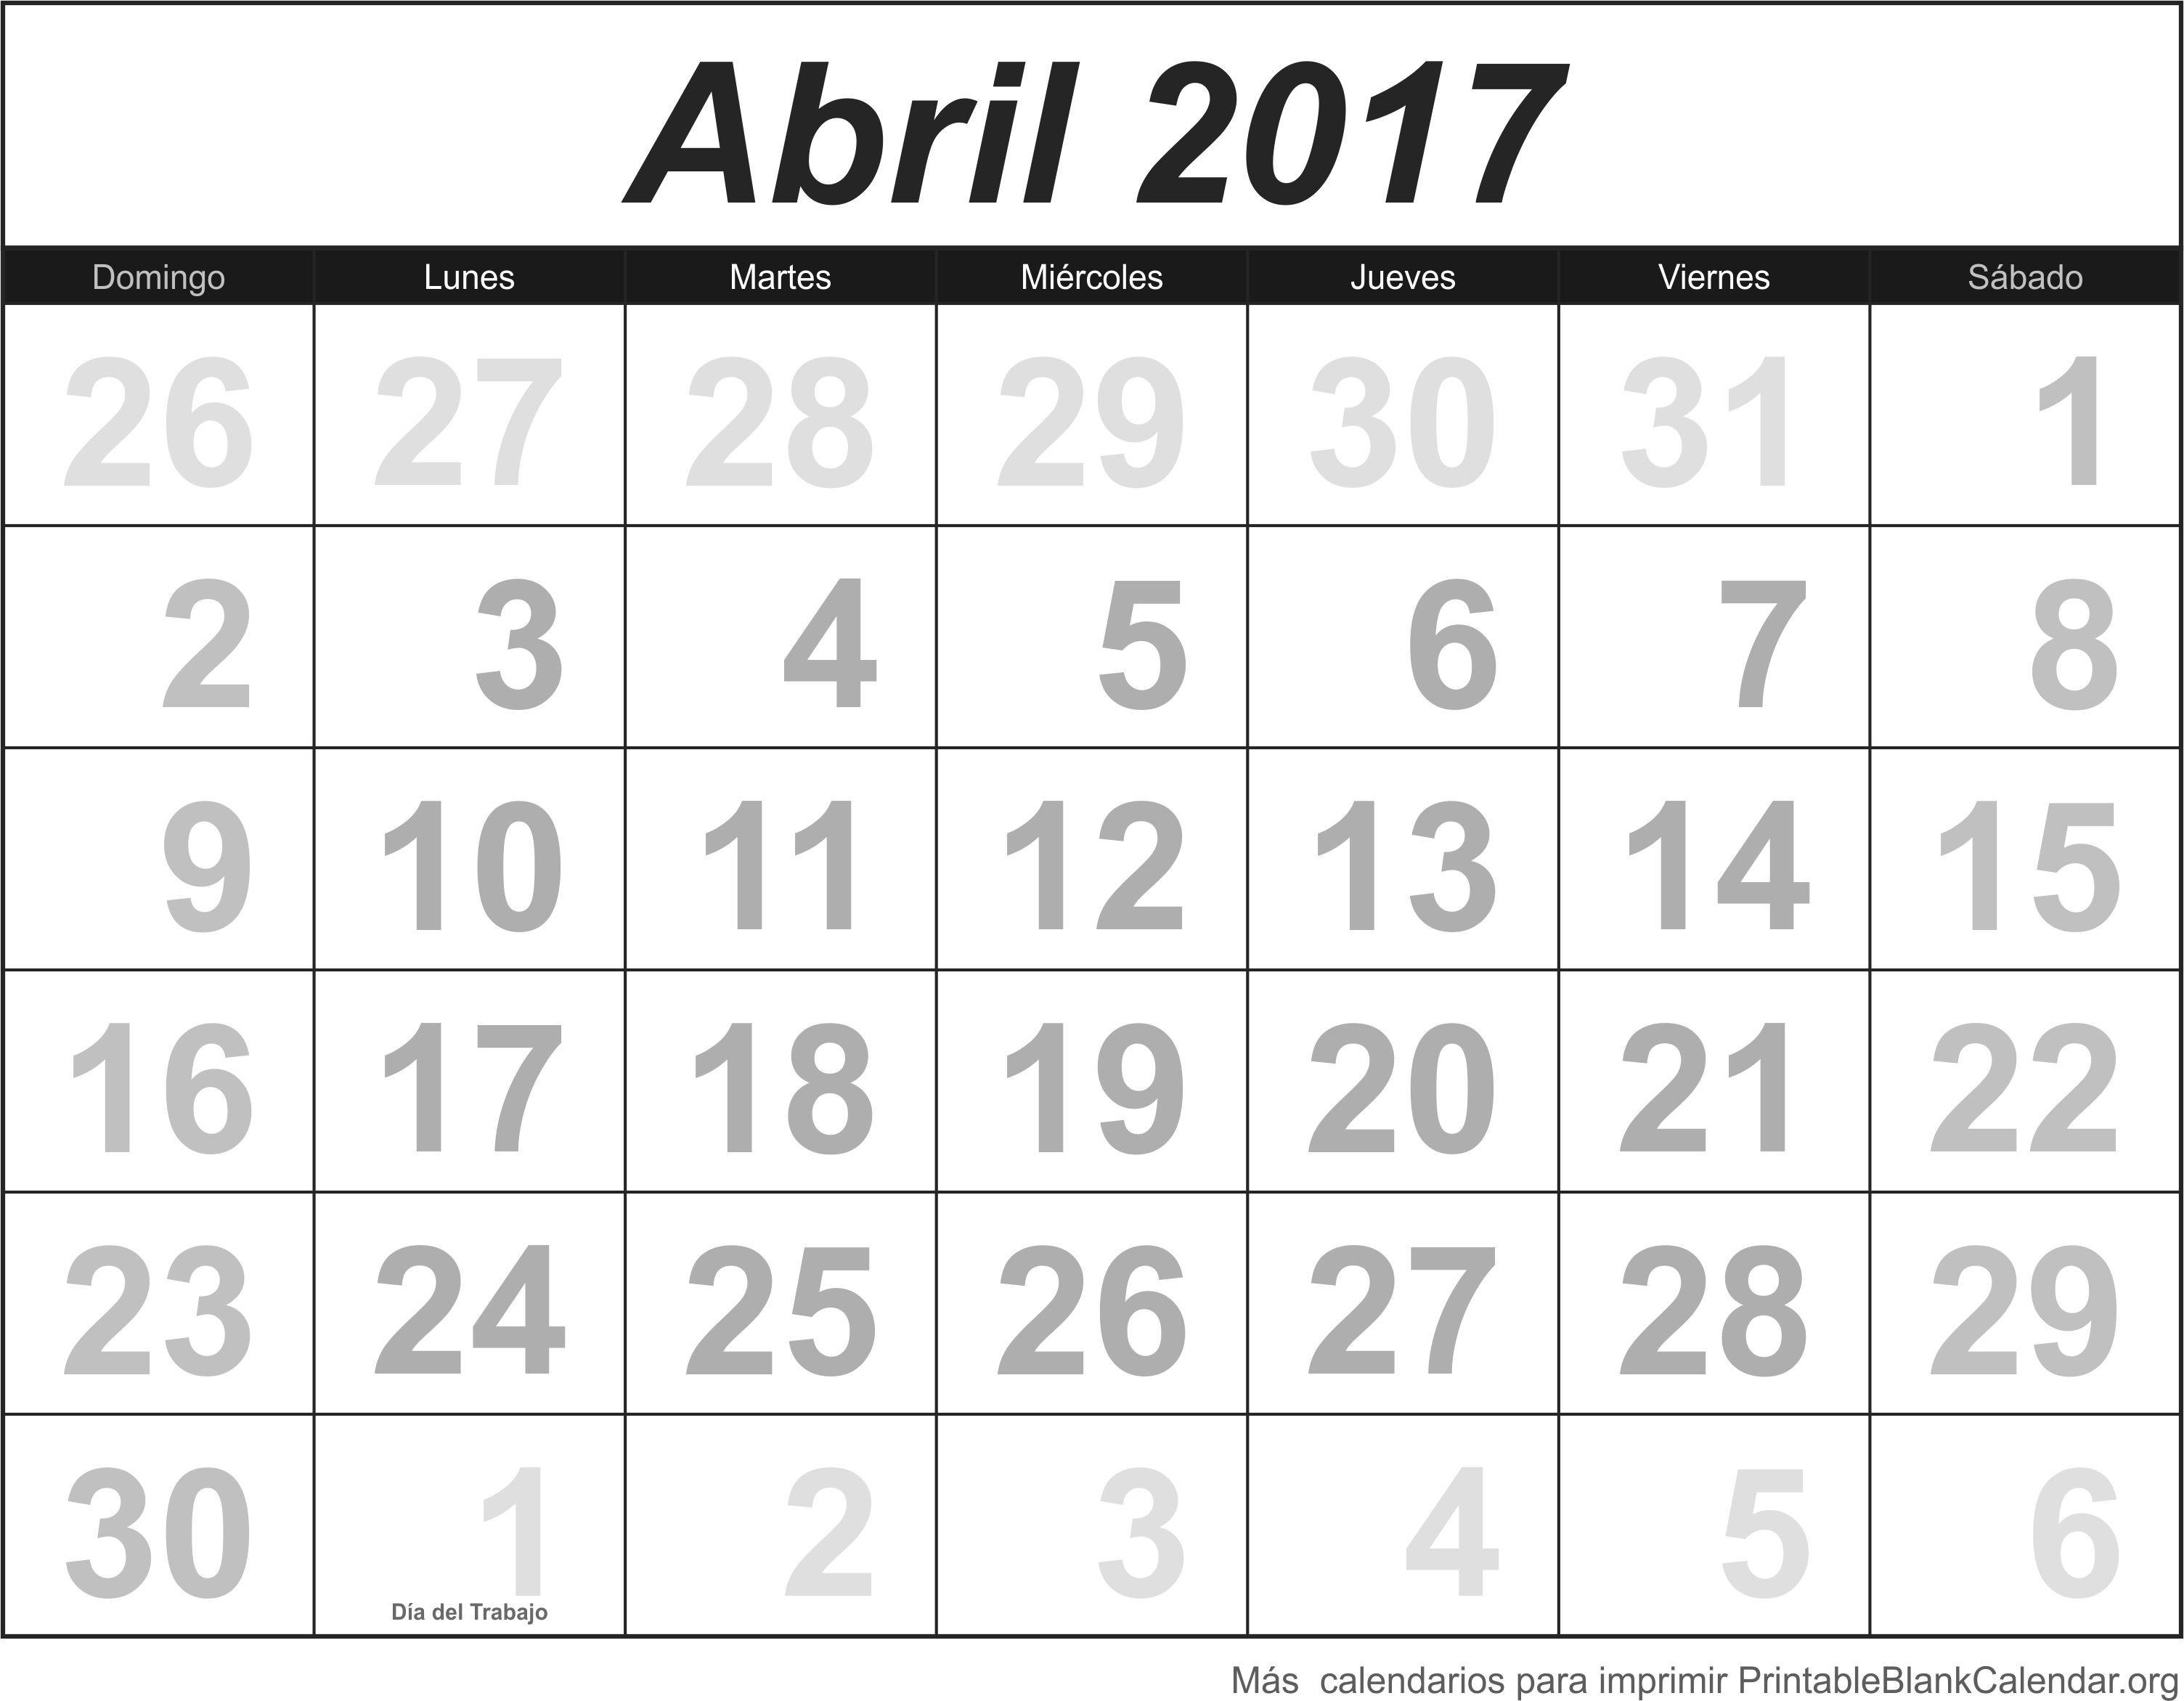 Imagenes De Calendarios Calendario Para Imprimir Abril